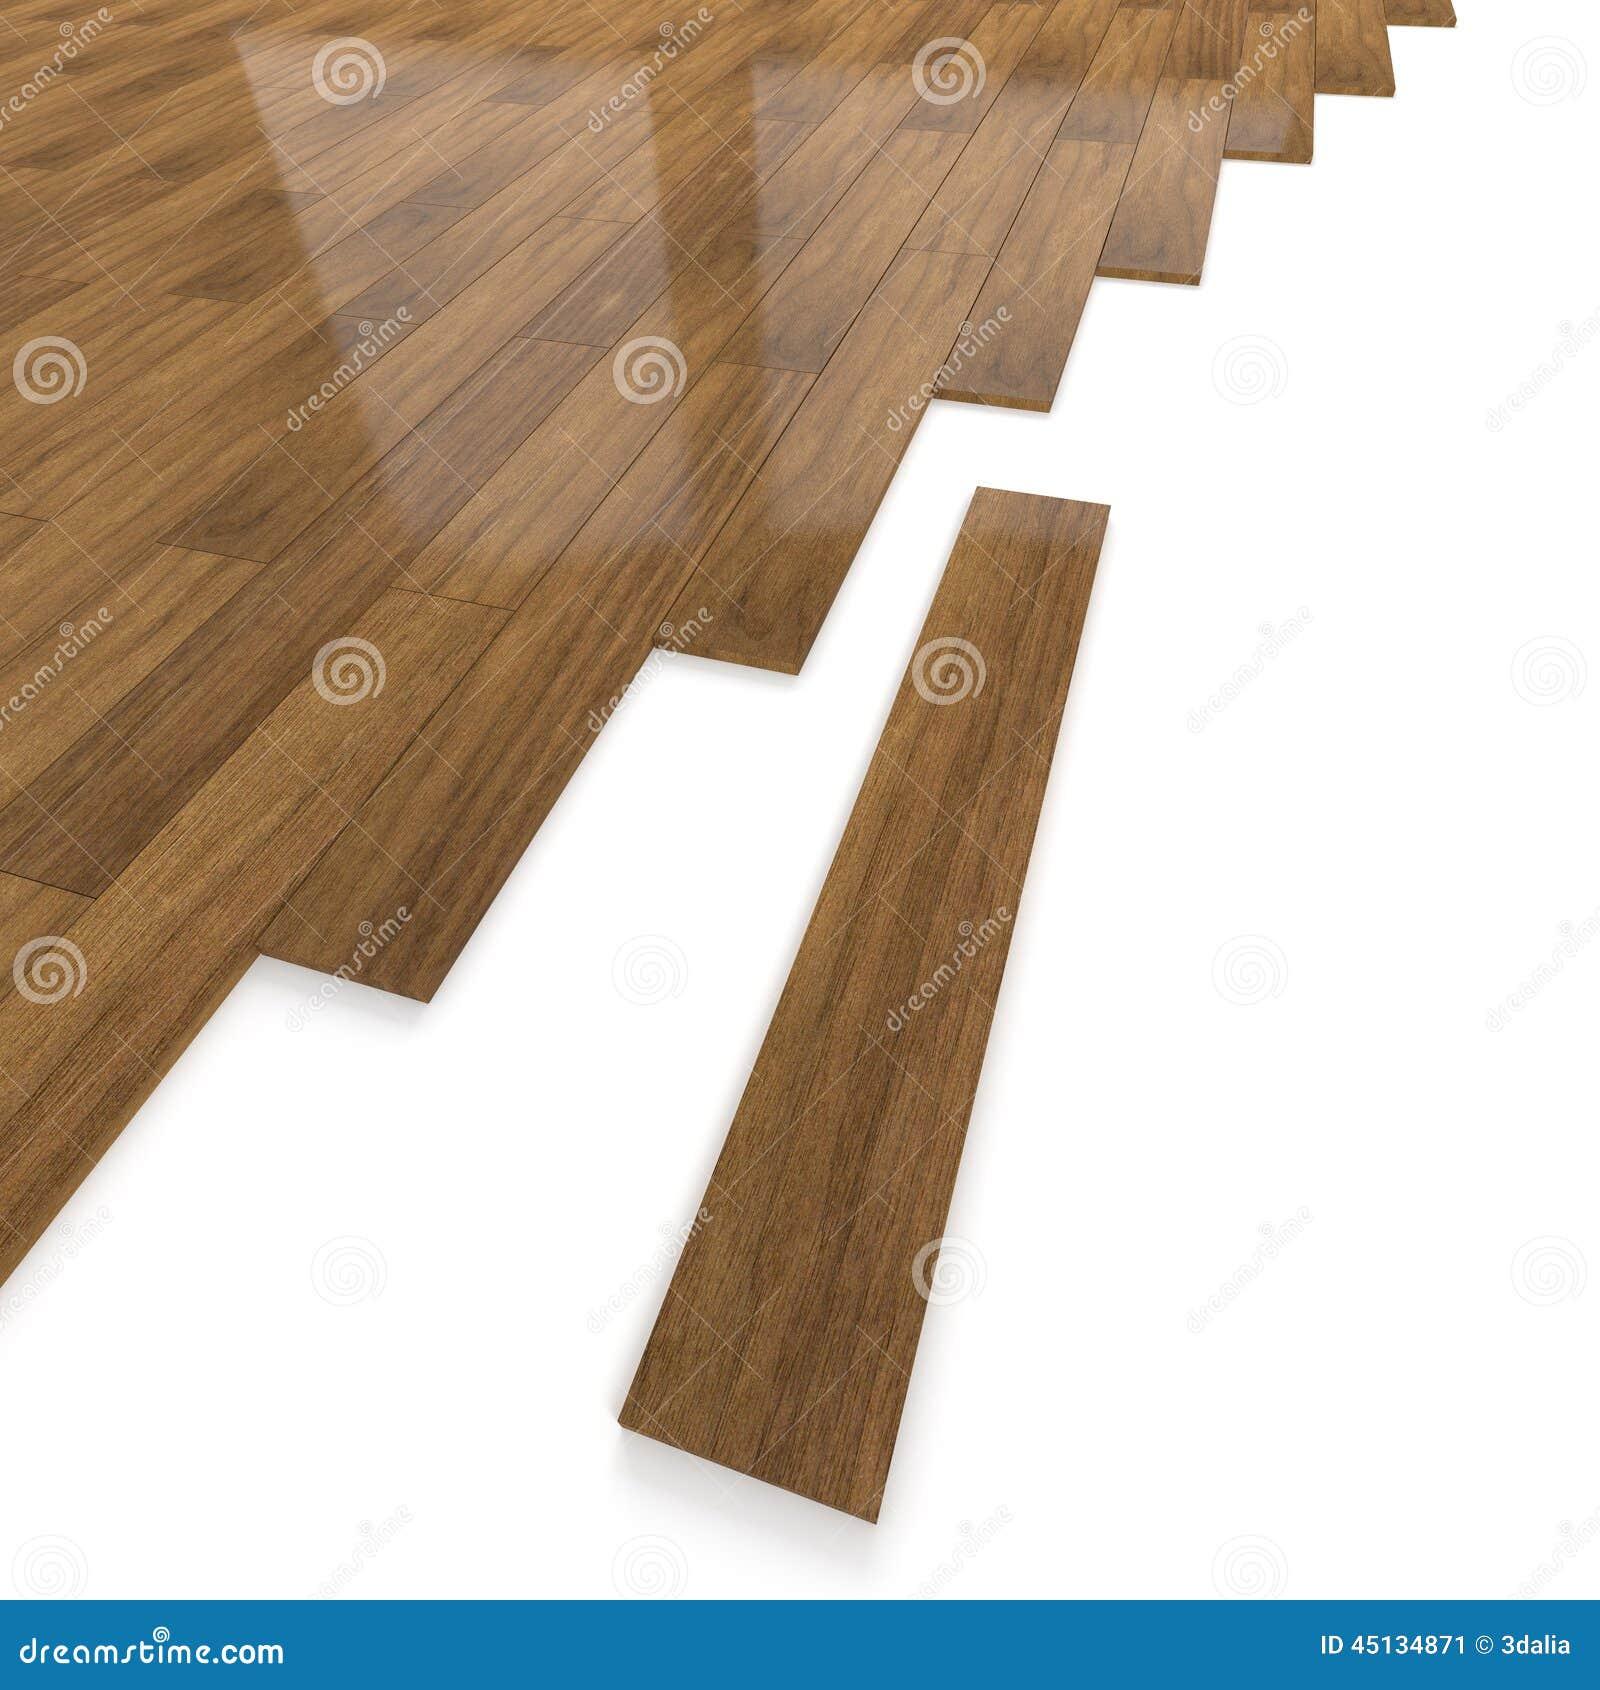 Dunkler Holzfussboden 3d Tiling Stock Abbildung Illustration Von